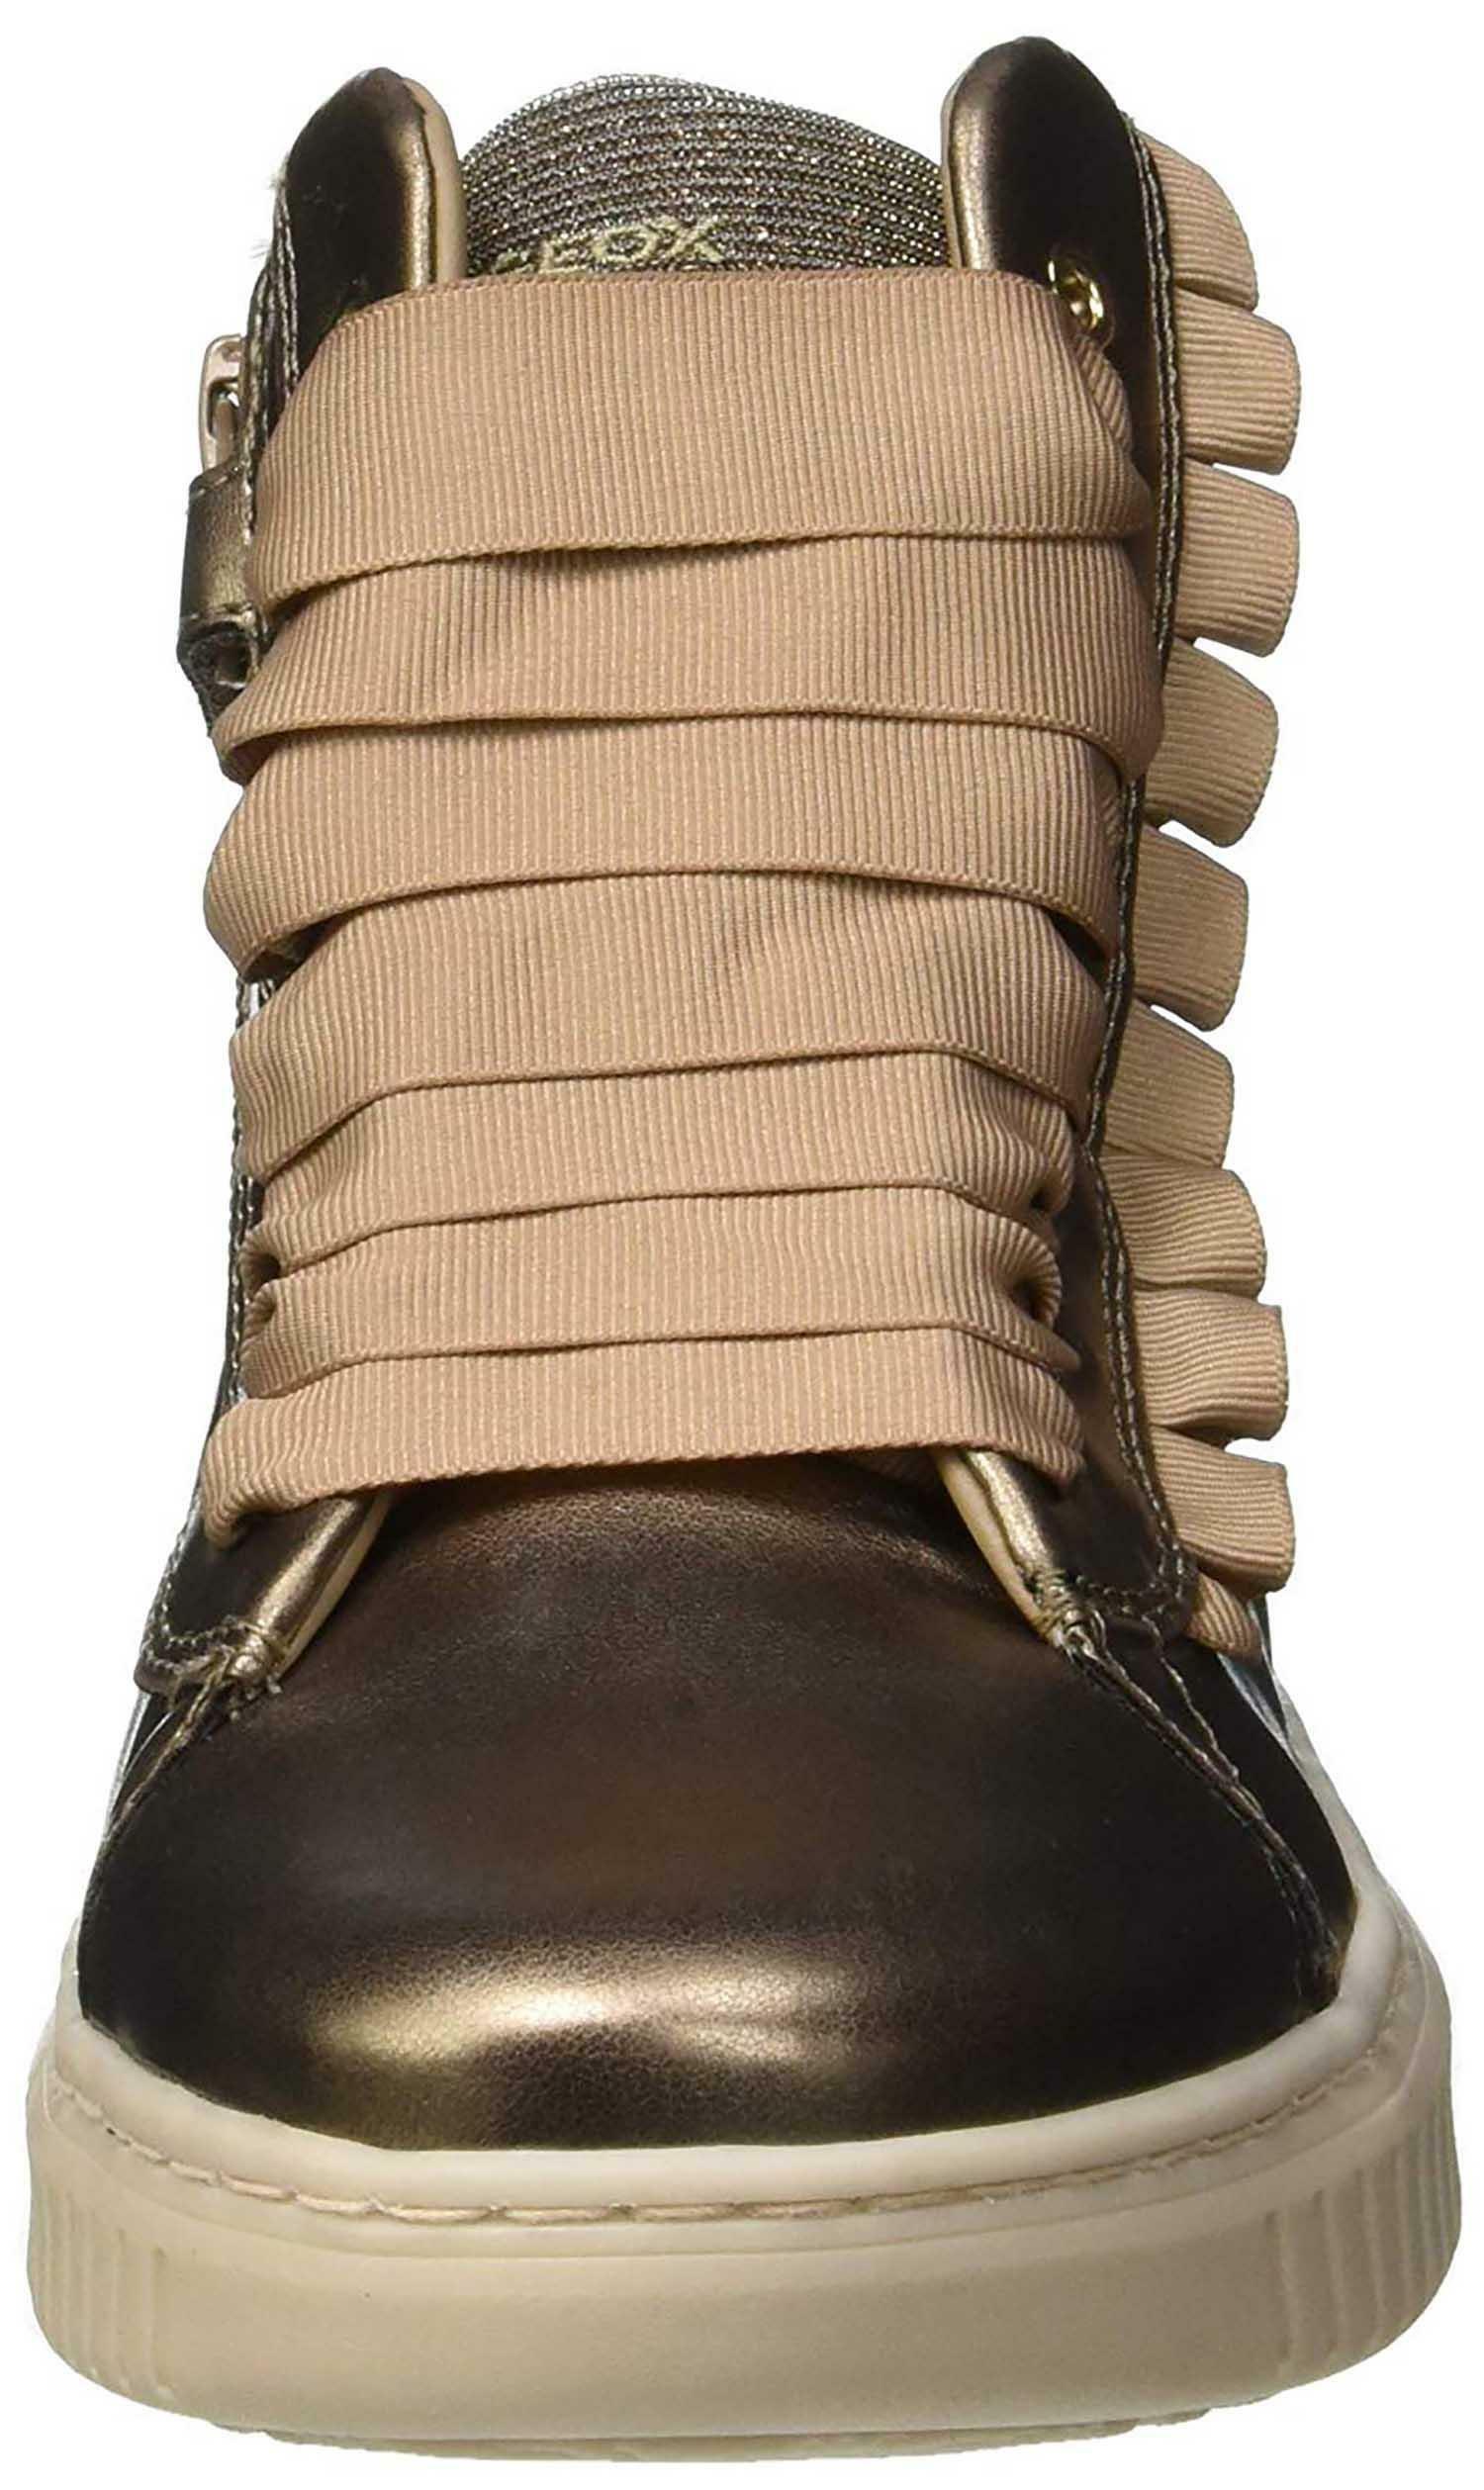 geox j discomix scarpe sportive bambina oro j847yac9003